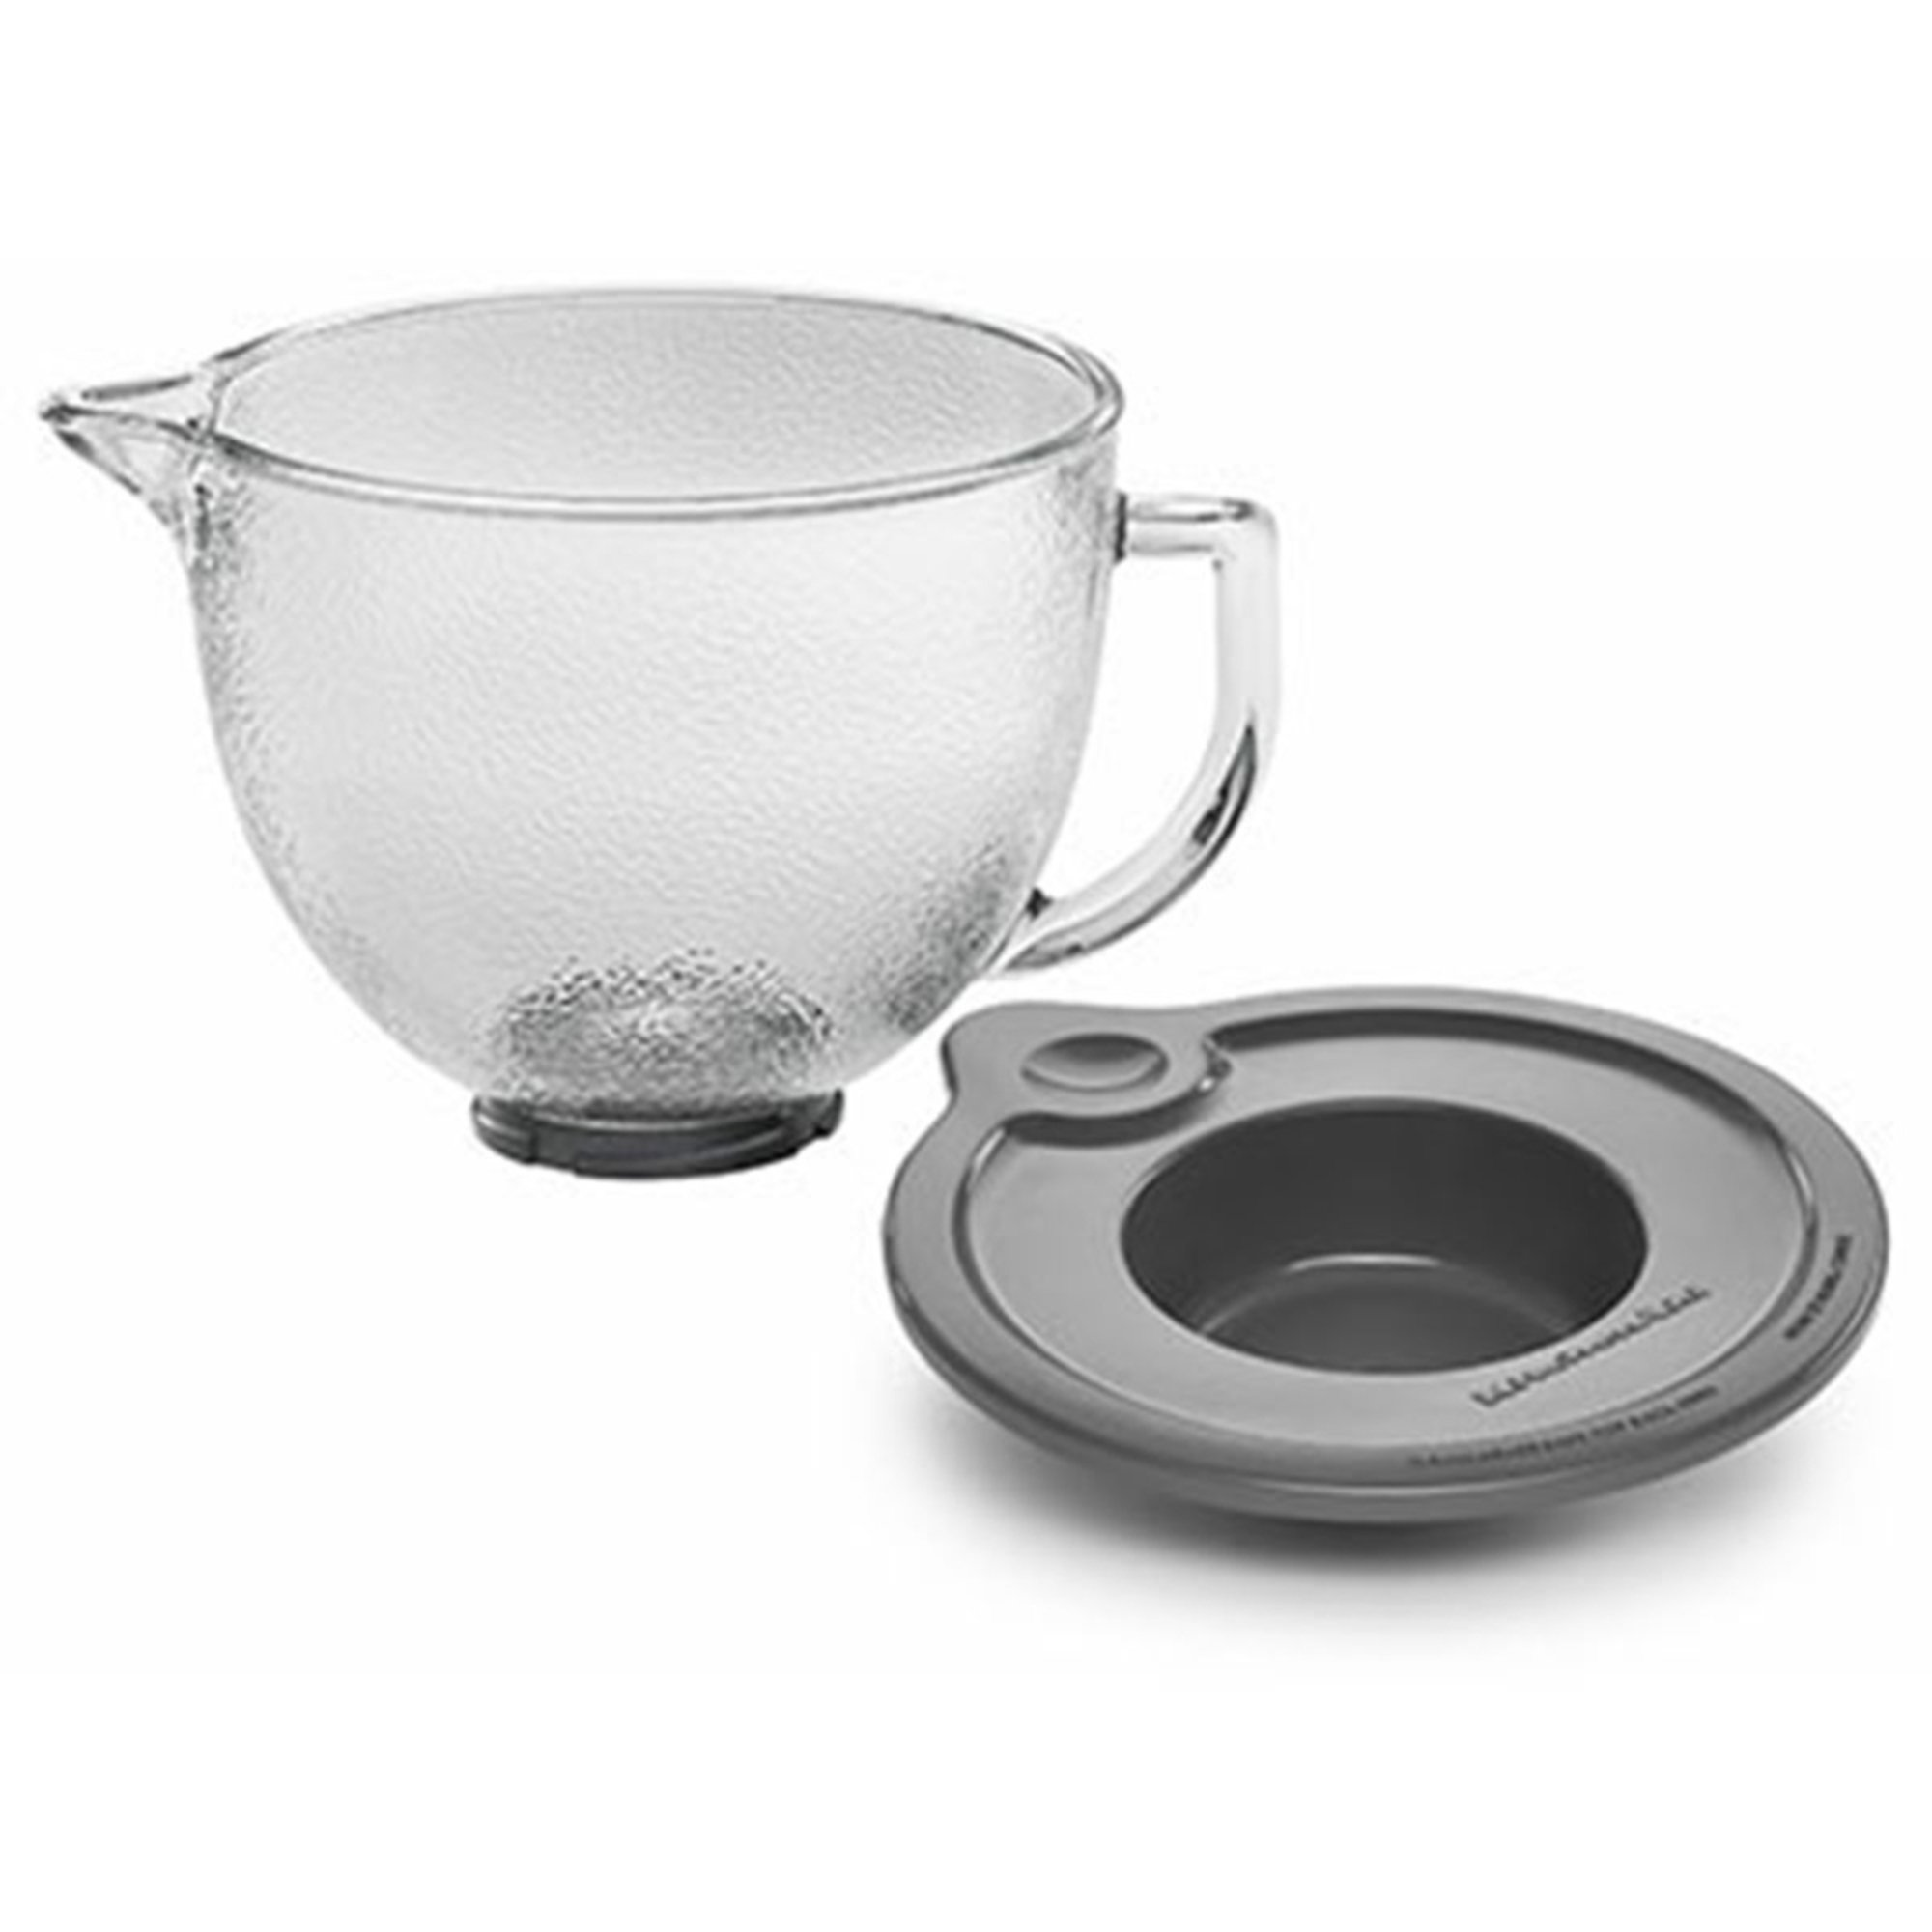 kitchenaid kitchenaid 5 quart hammered glass bowl with lid for tilt